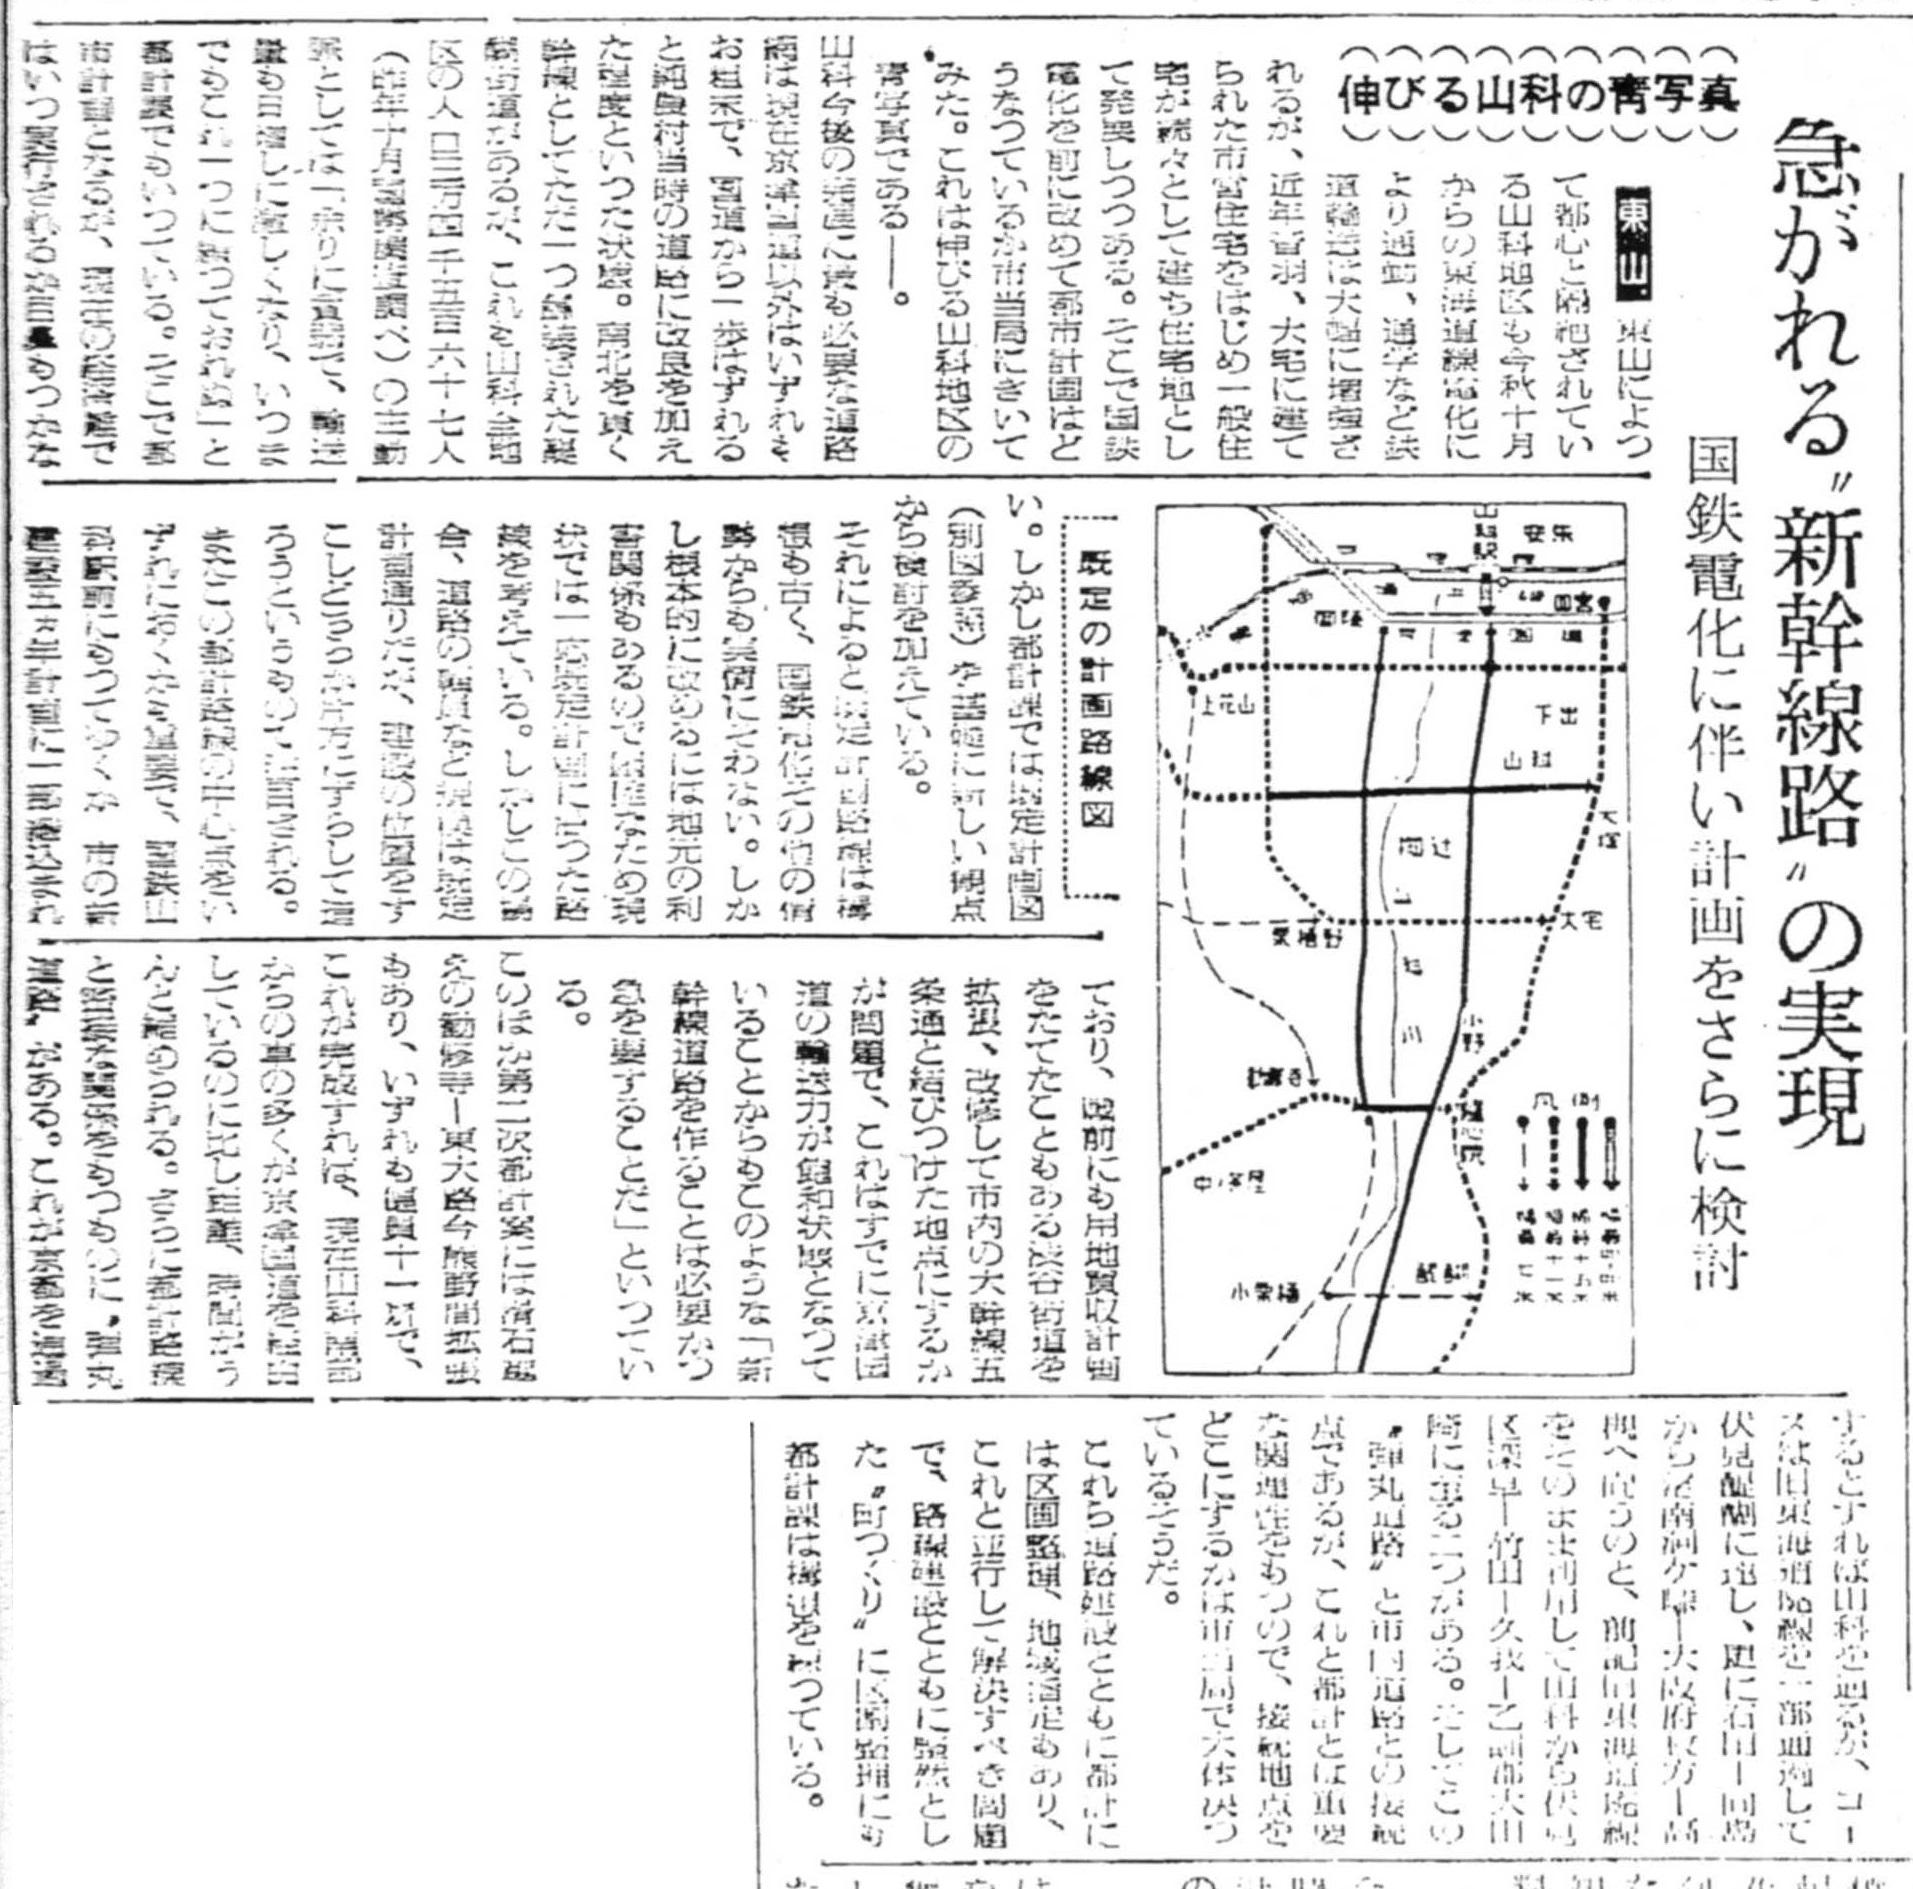 S31.4.7KC 山科幹線道路計画b